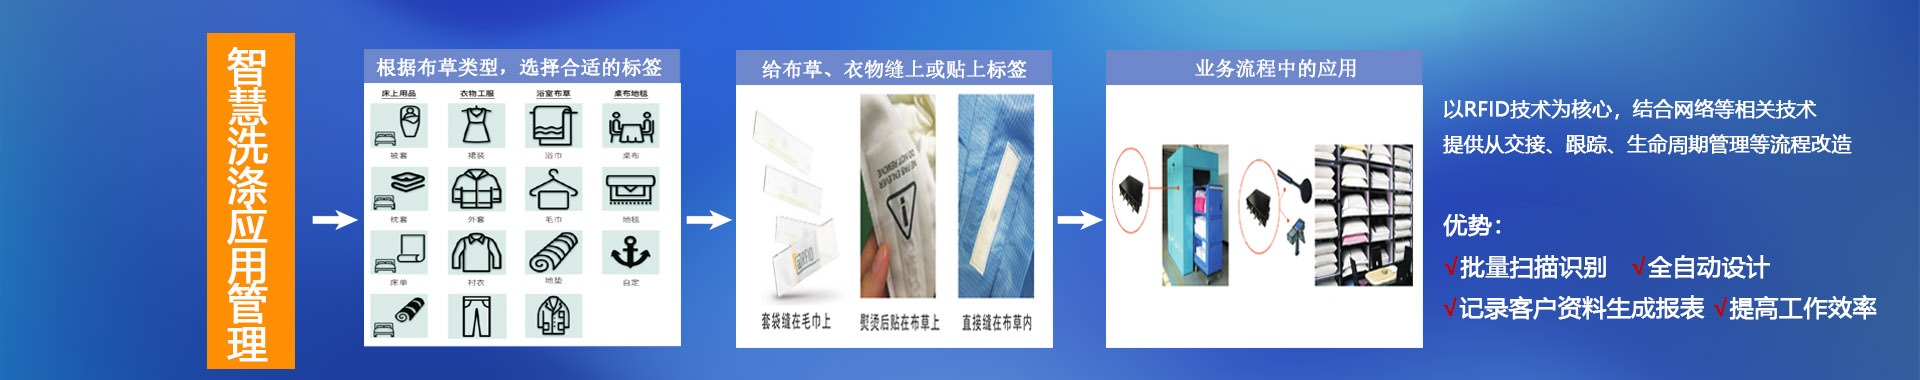 RFID冷链医疗